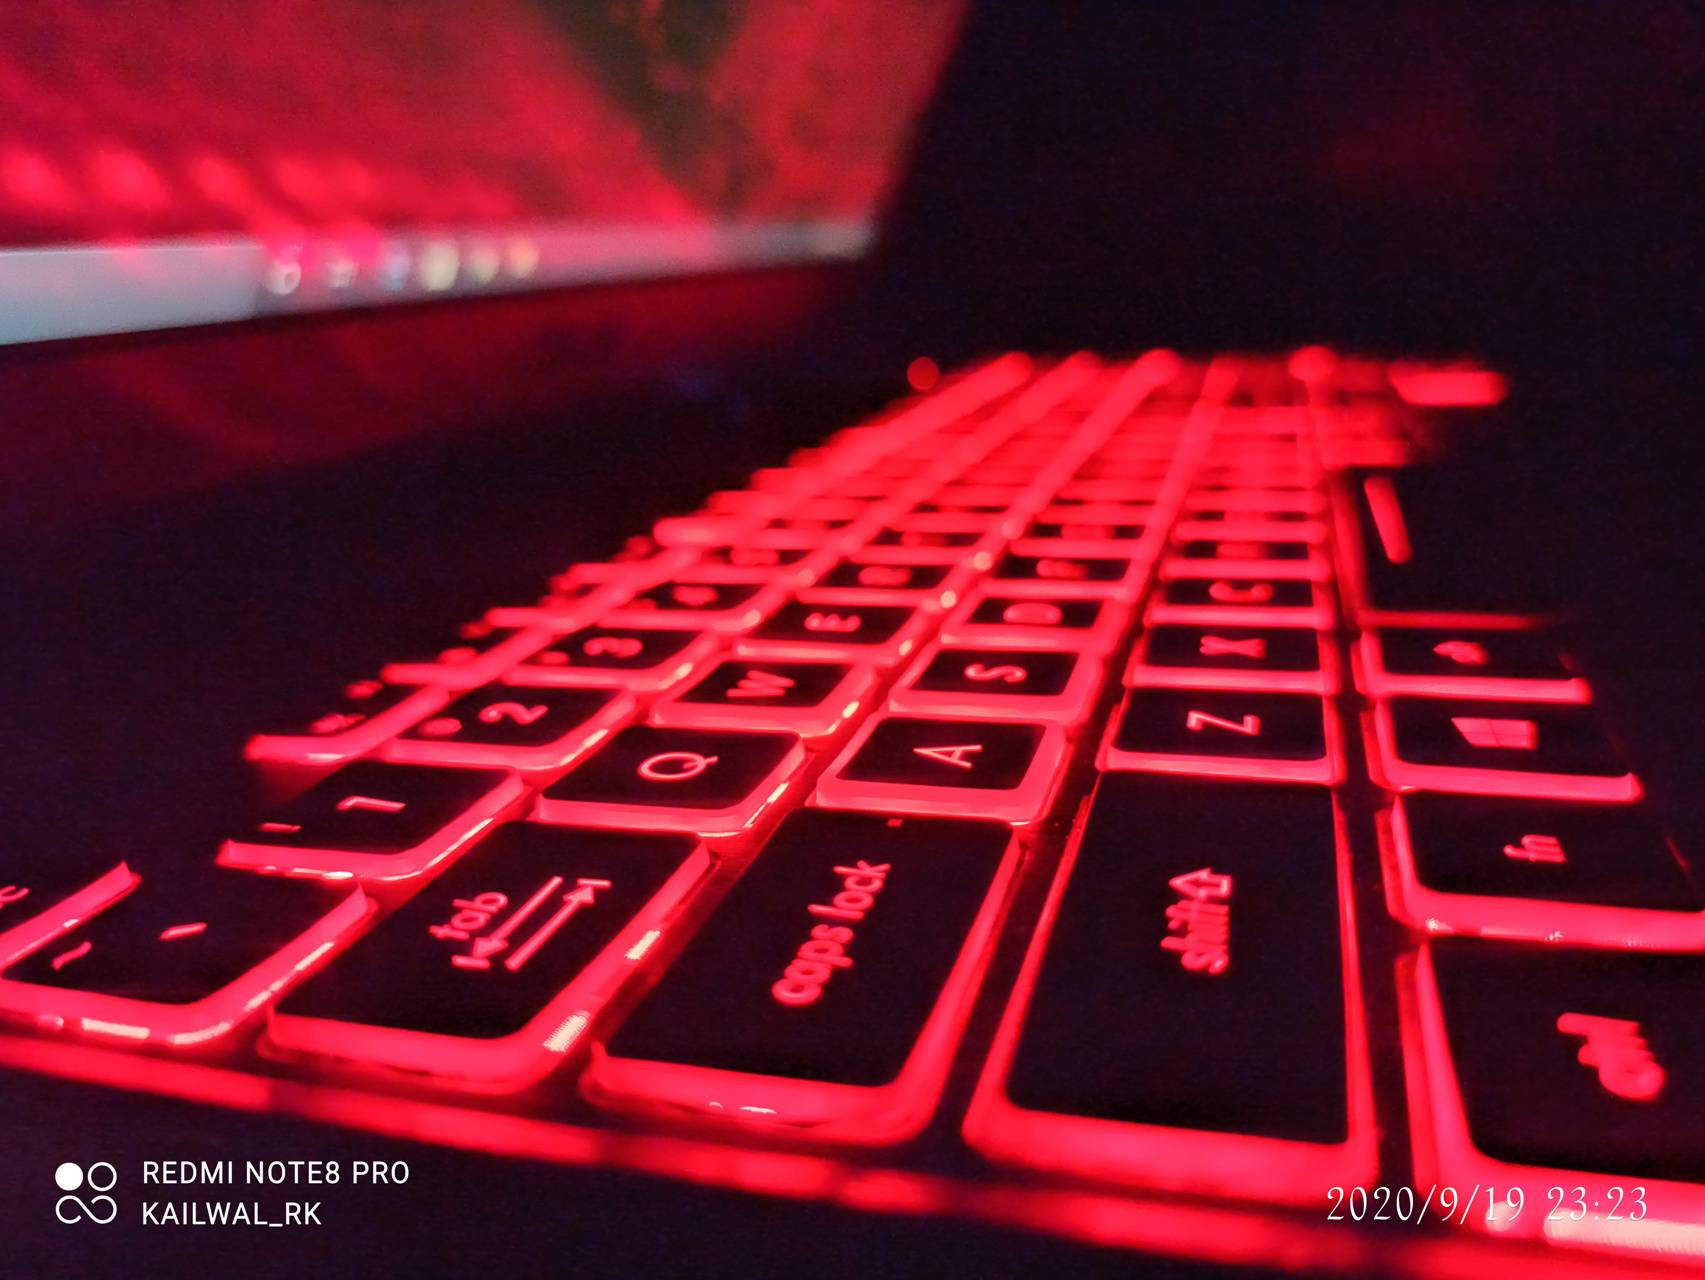 Red pad keyboard